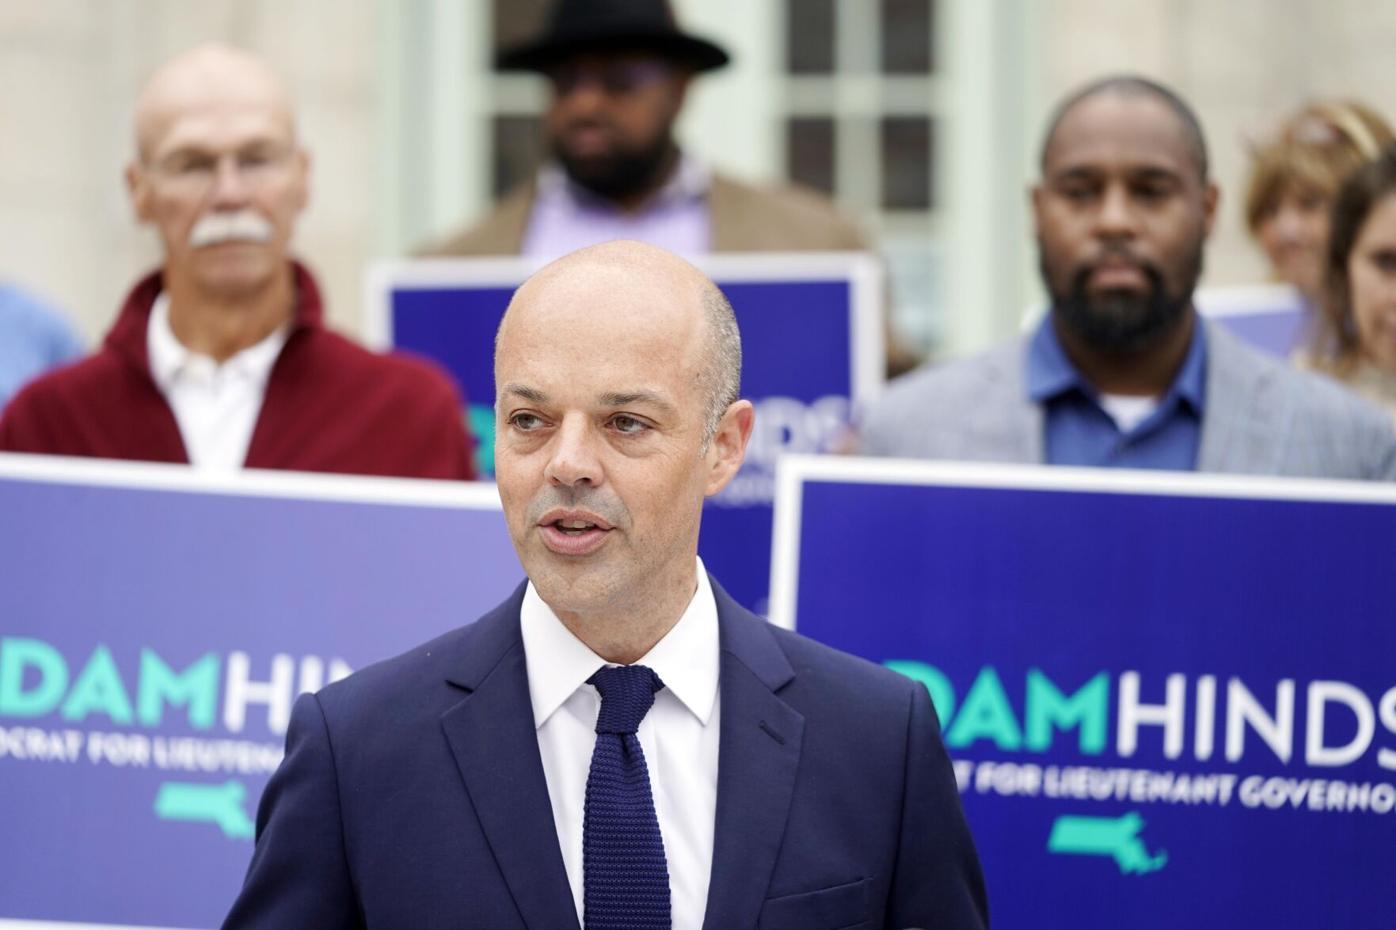 State Senator Adam Hinds